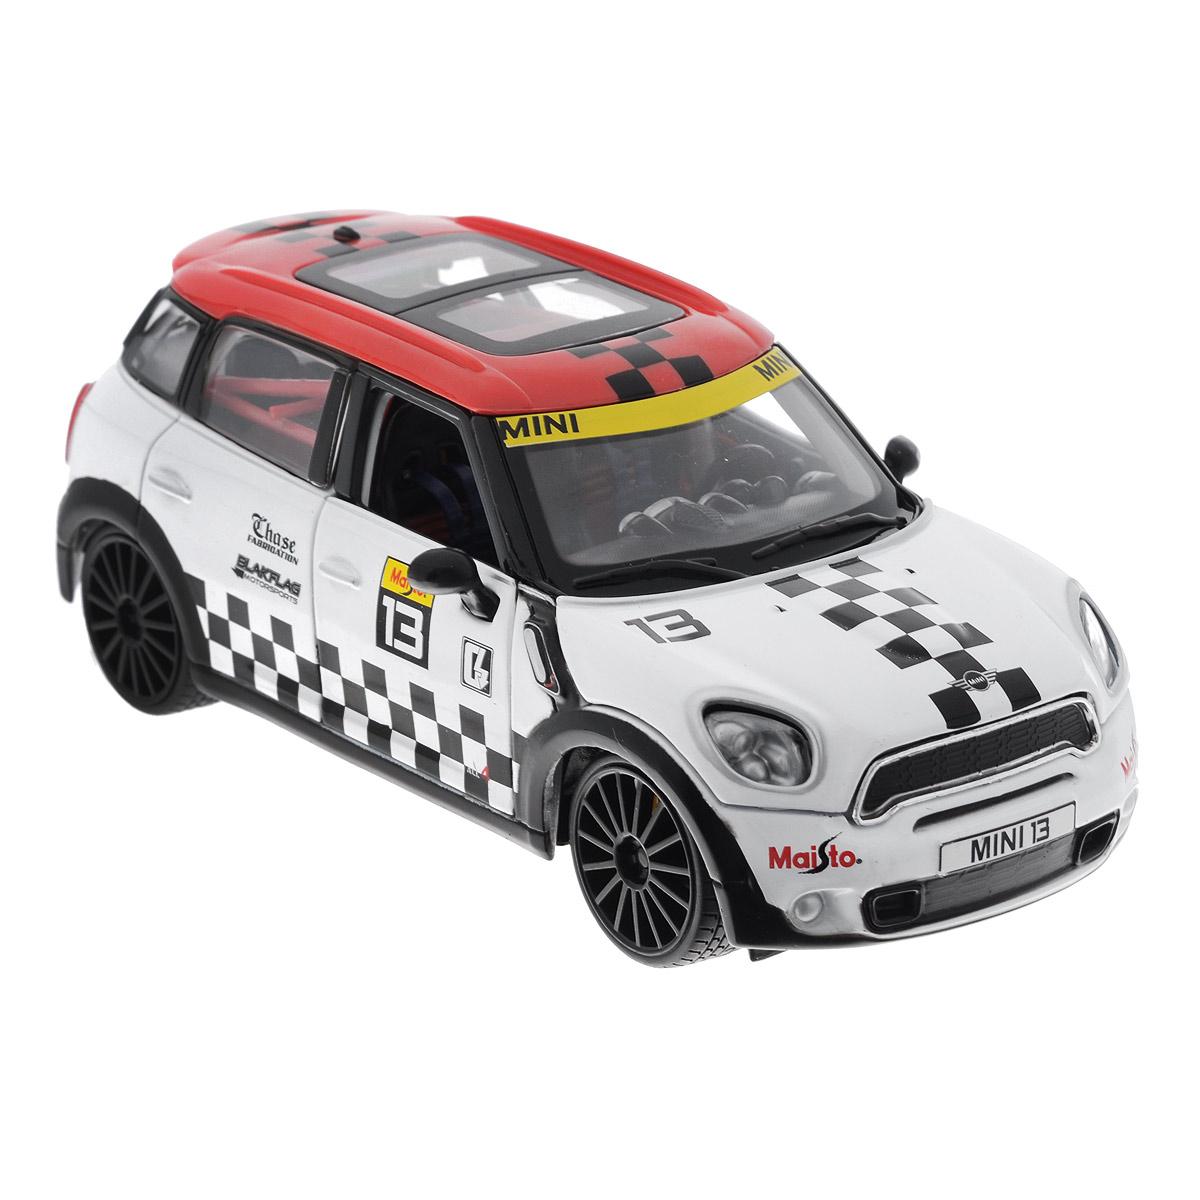 Maisto Модель автомобиля Mini Cooper Countryman 31367